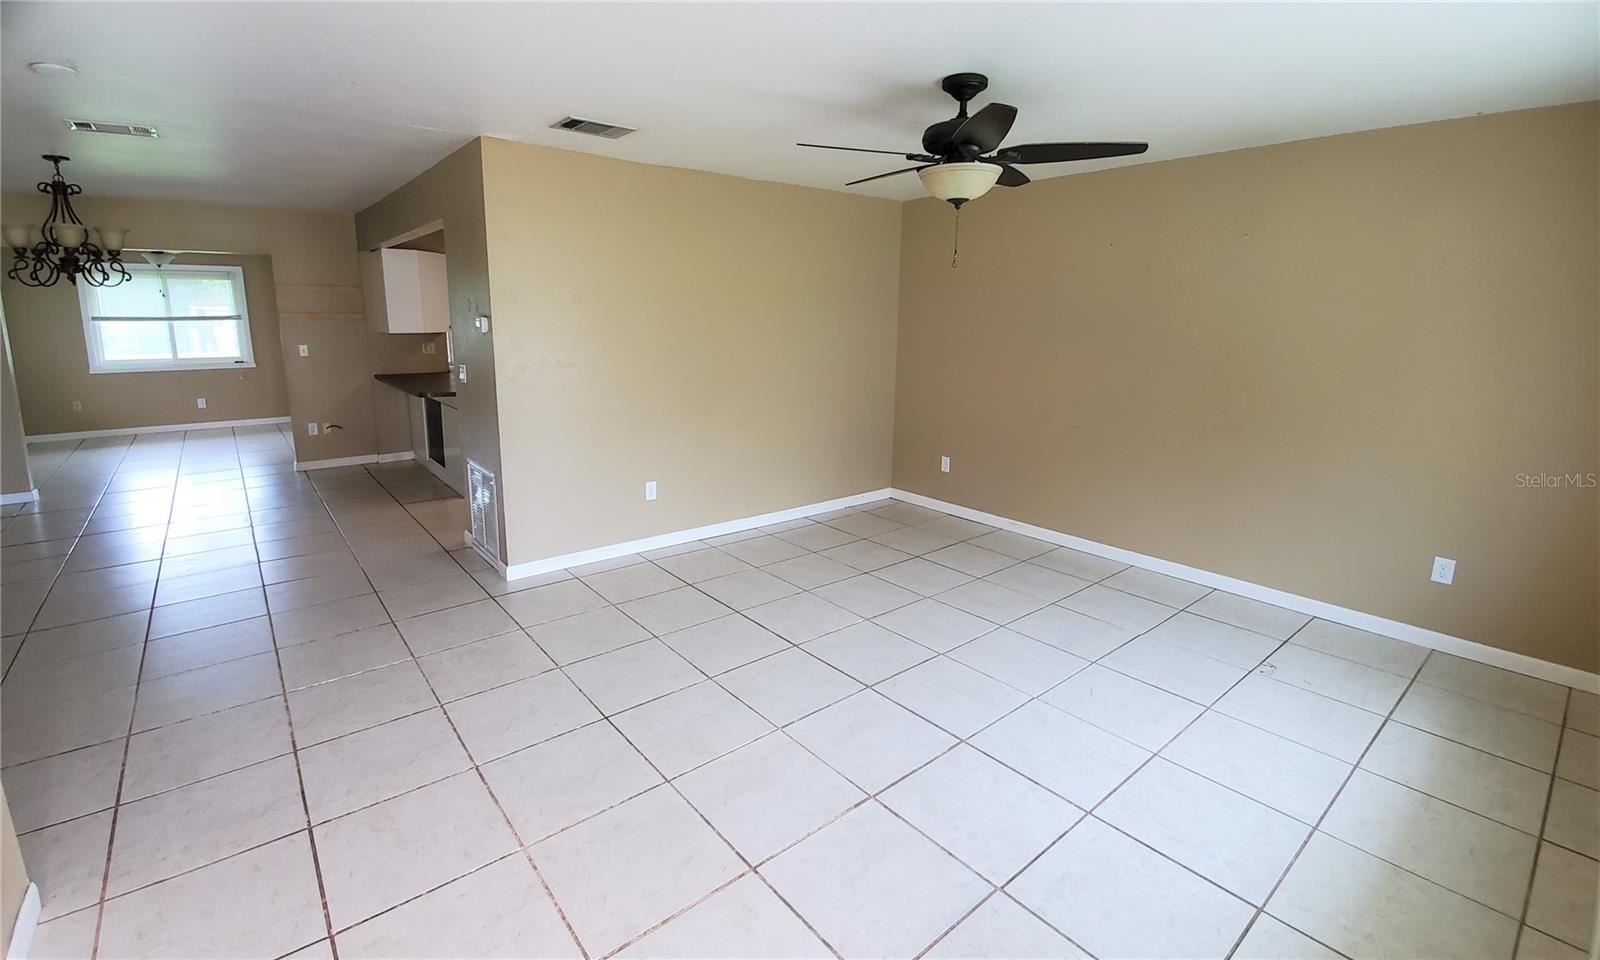 Photo of 6703 ELECTRA AVENUE, NORTH PORT, FL 34287 (MLS # N6116530)